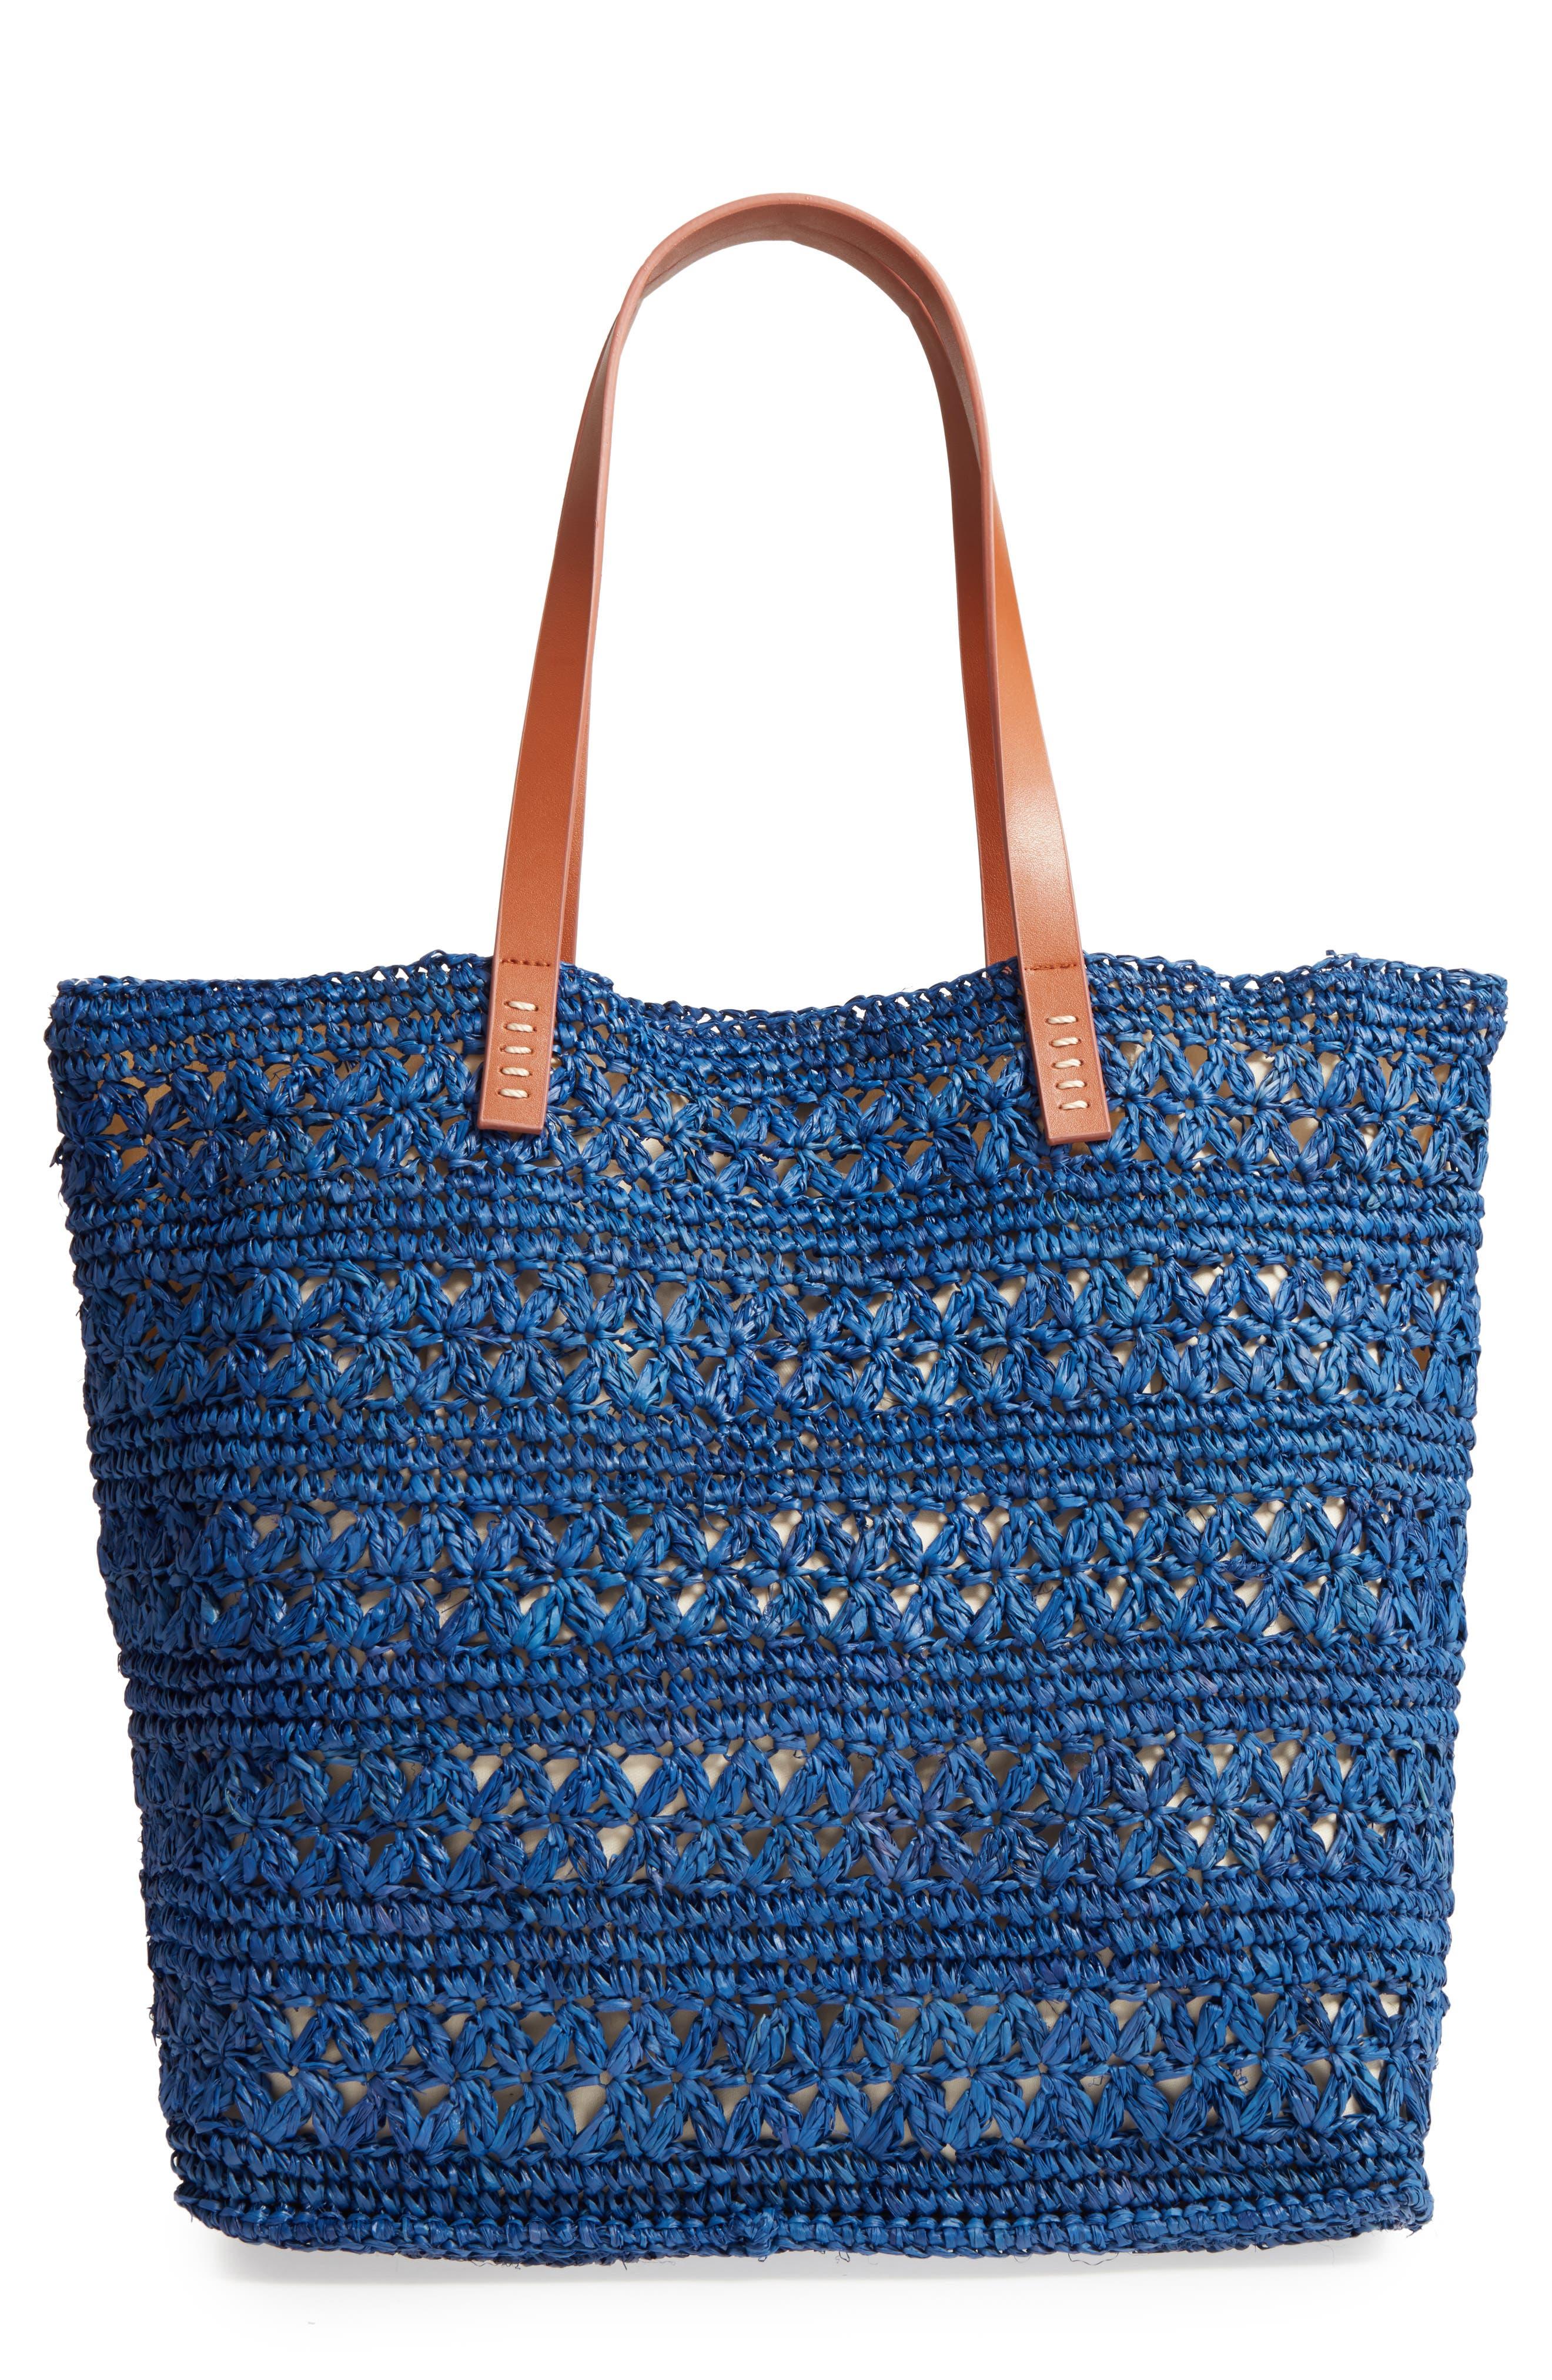 Nordstrom Packable Raffia Crochet Tote